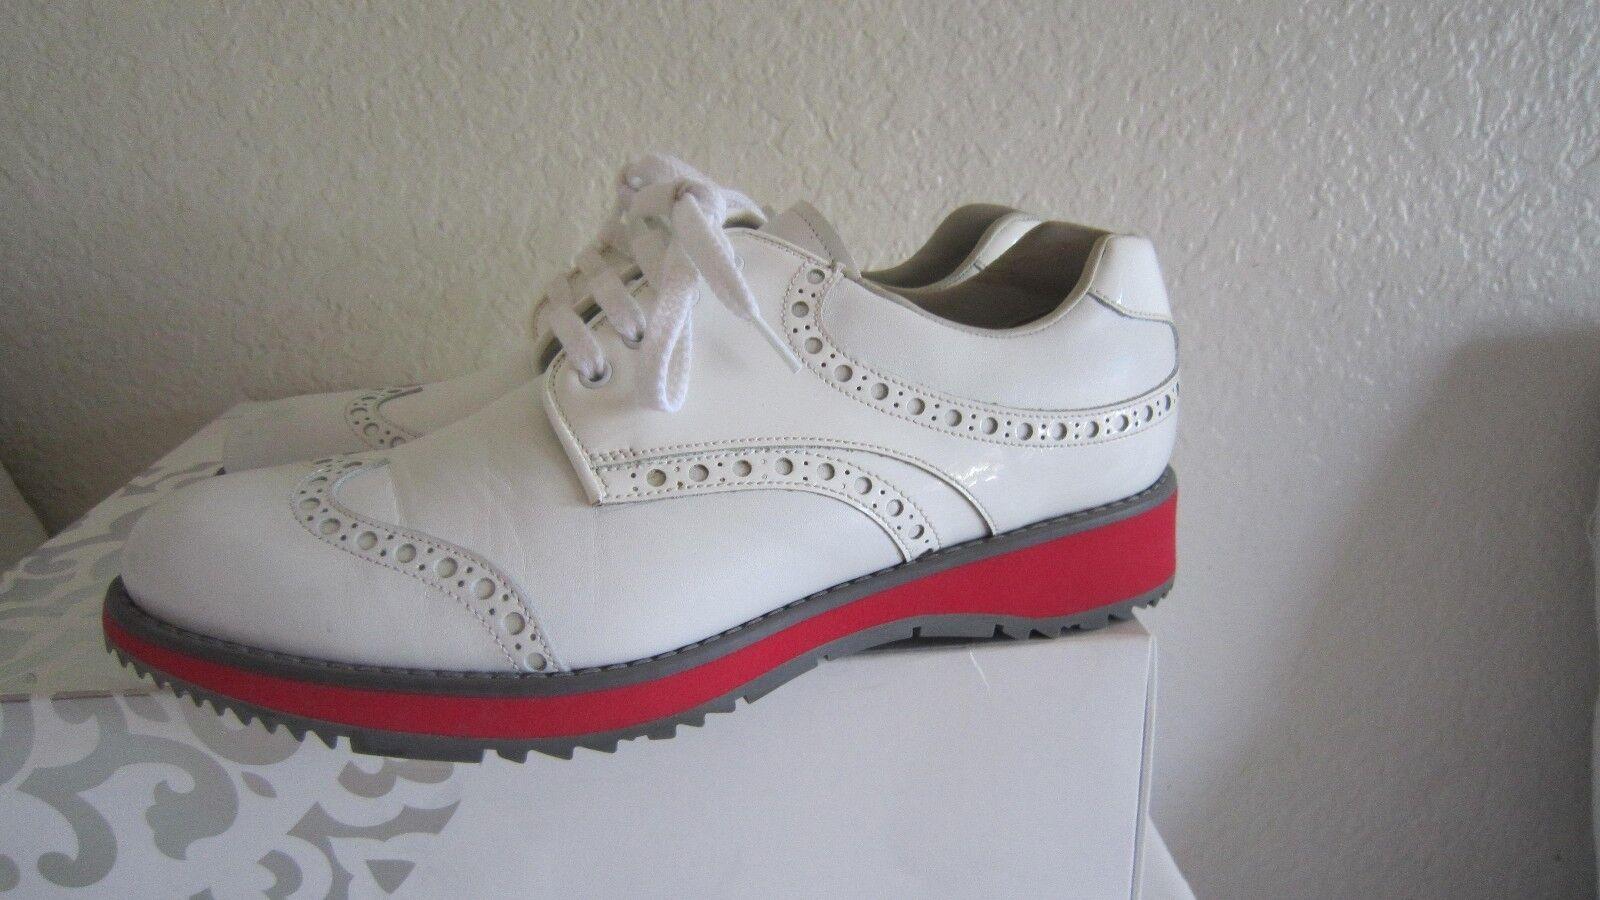 Prada Wingtip bianca Leather/Patent Oxford Platform Scarpe da Ginnastica Shoes Sz 38.5 Us 8.5